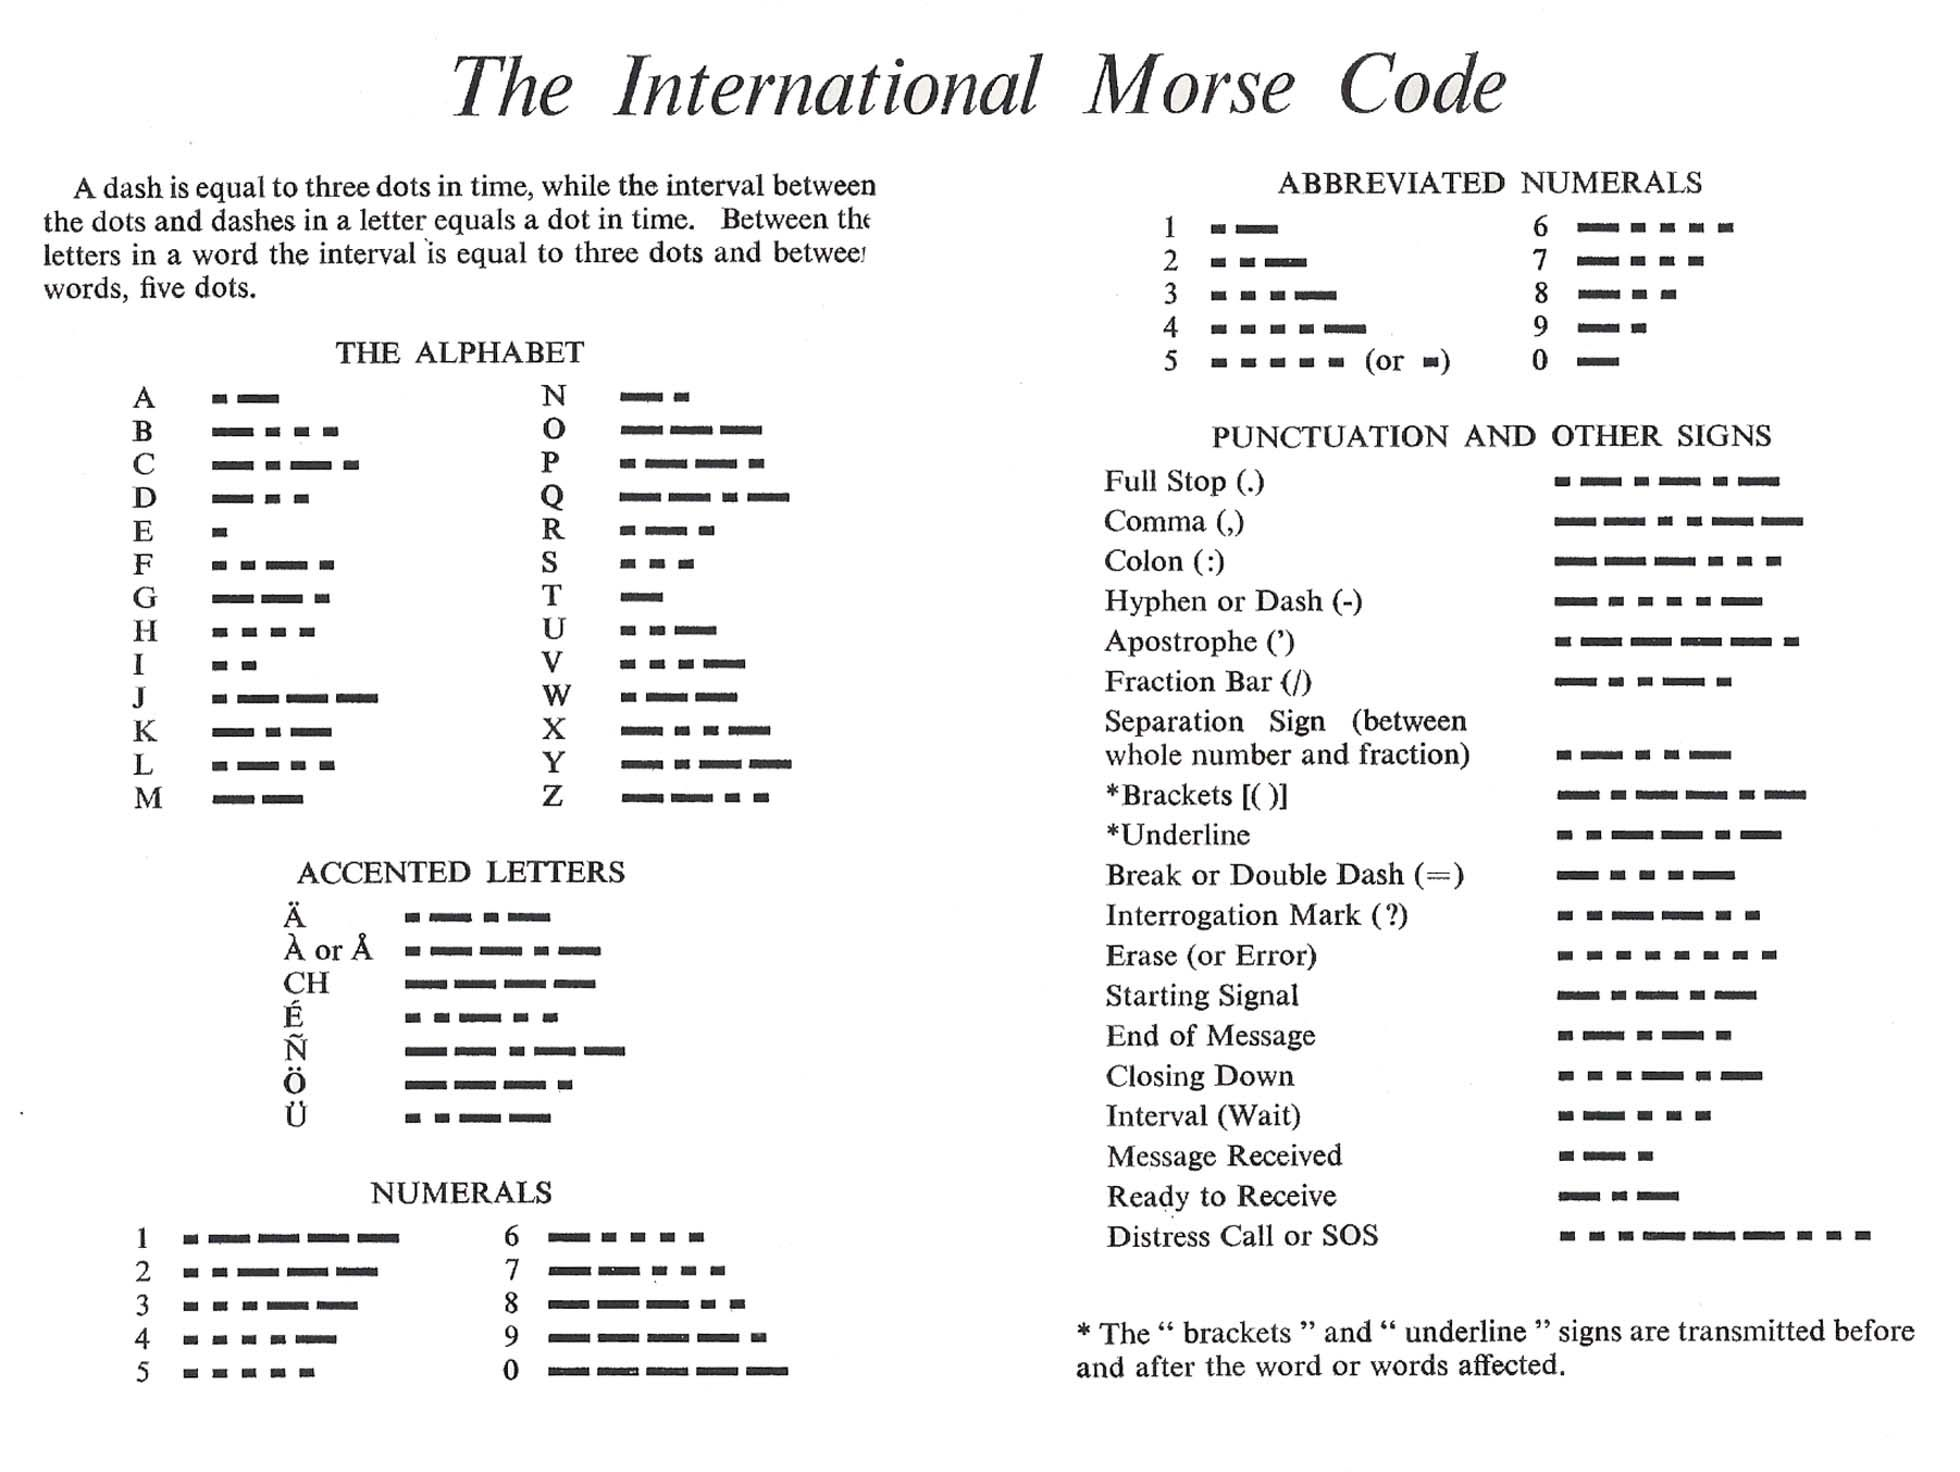 Worksheets Morse Code Worksheet morse code imginternational interesting things code